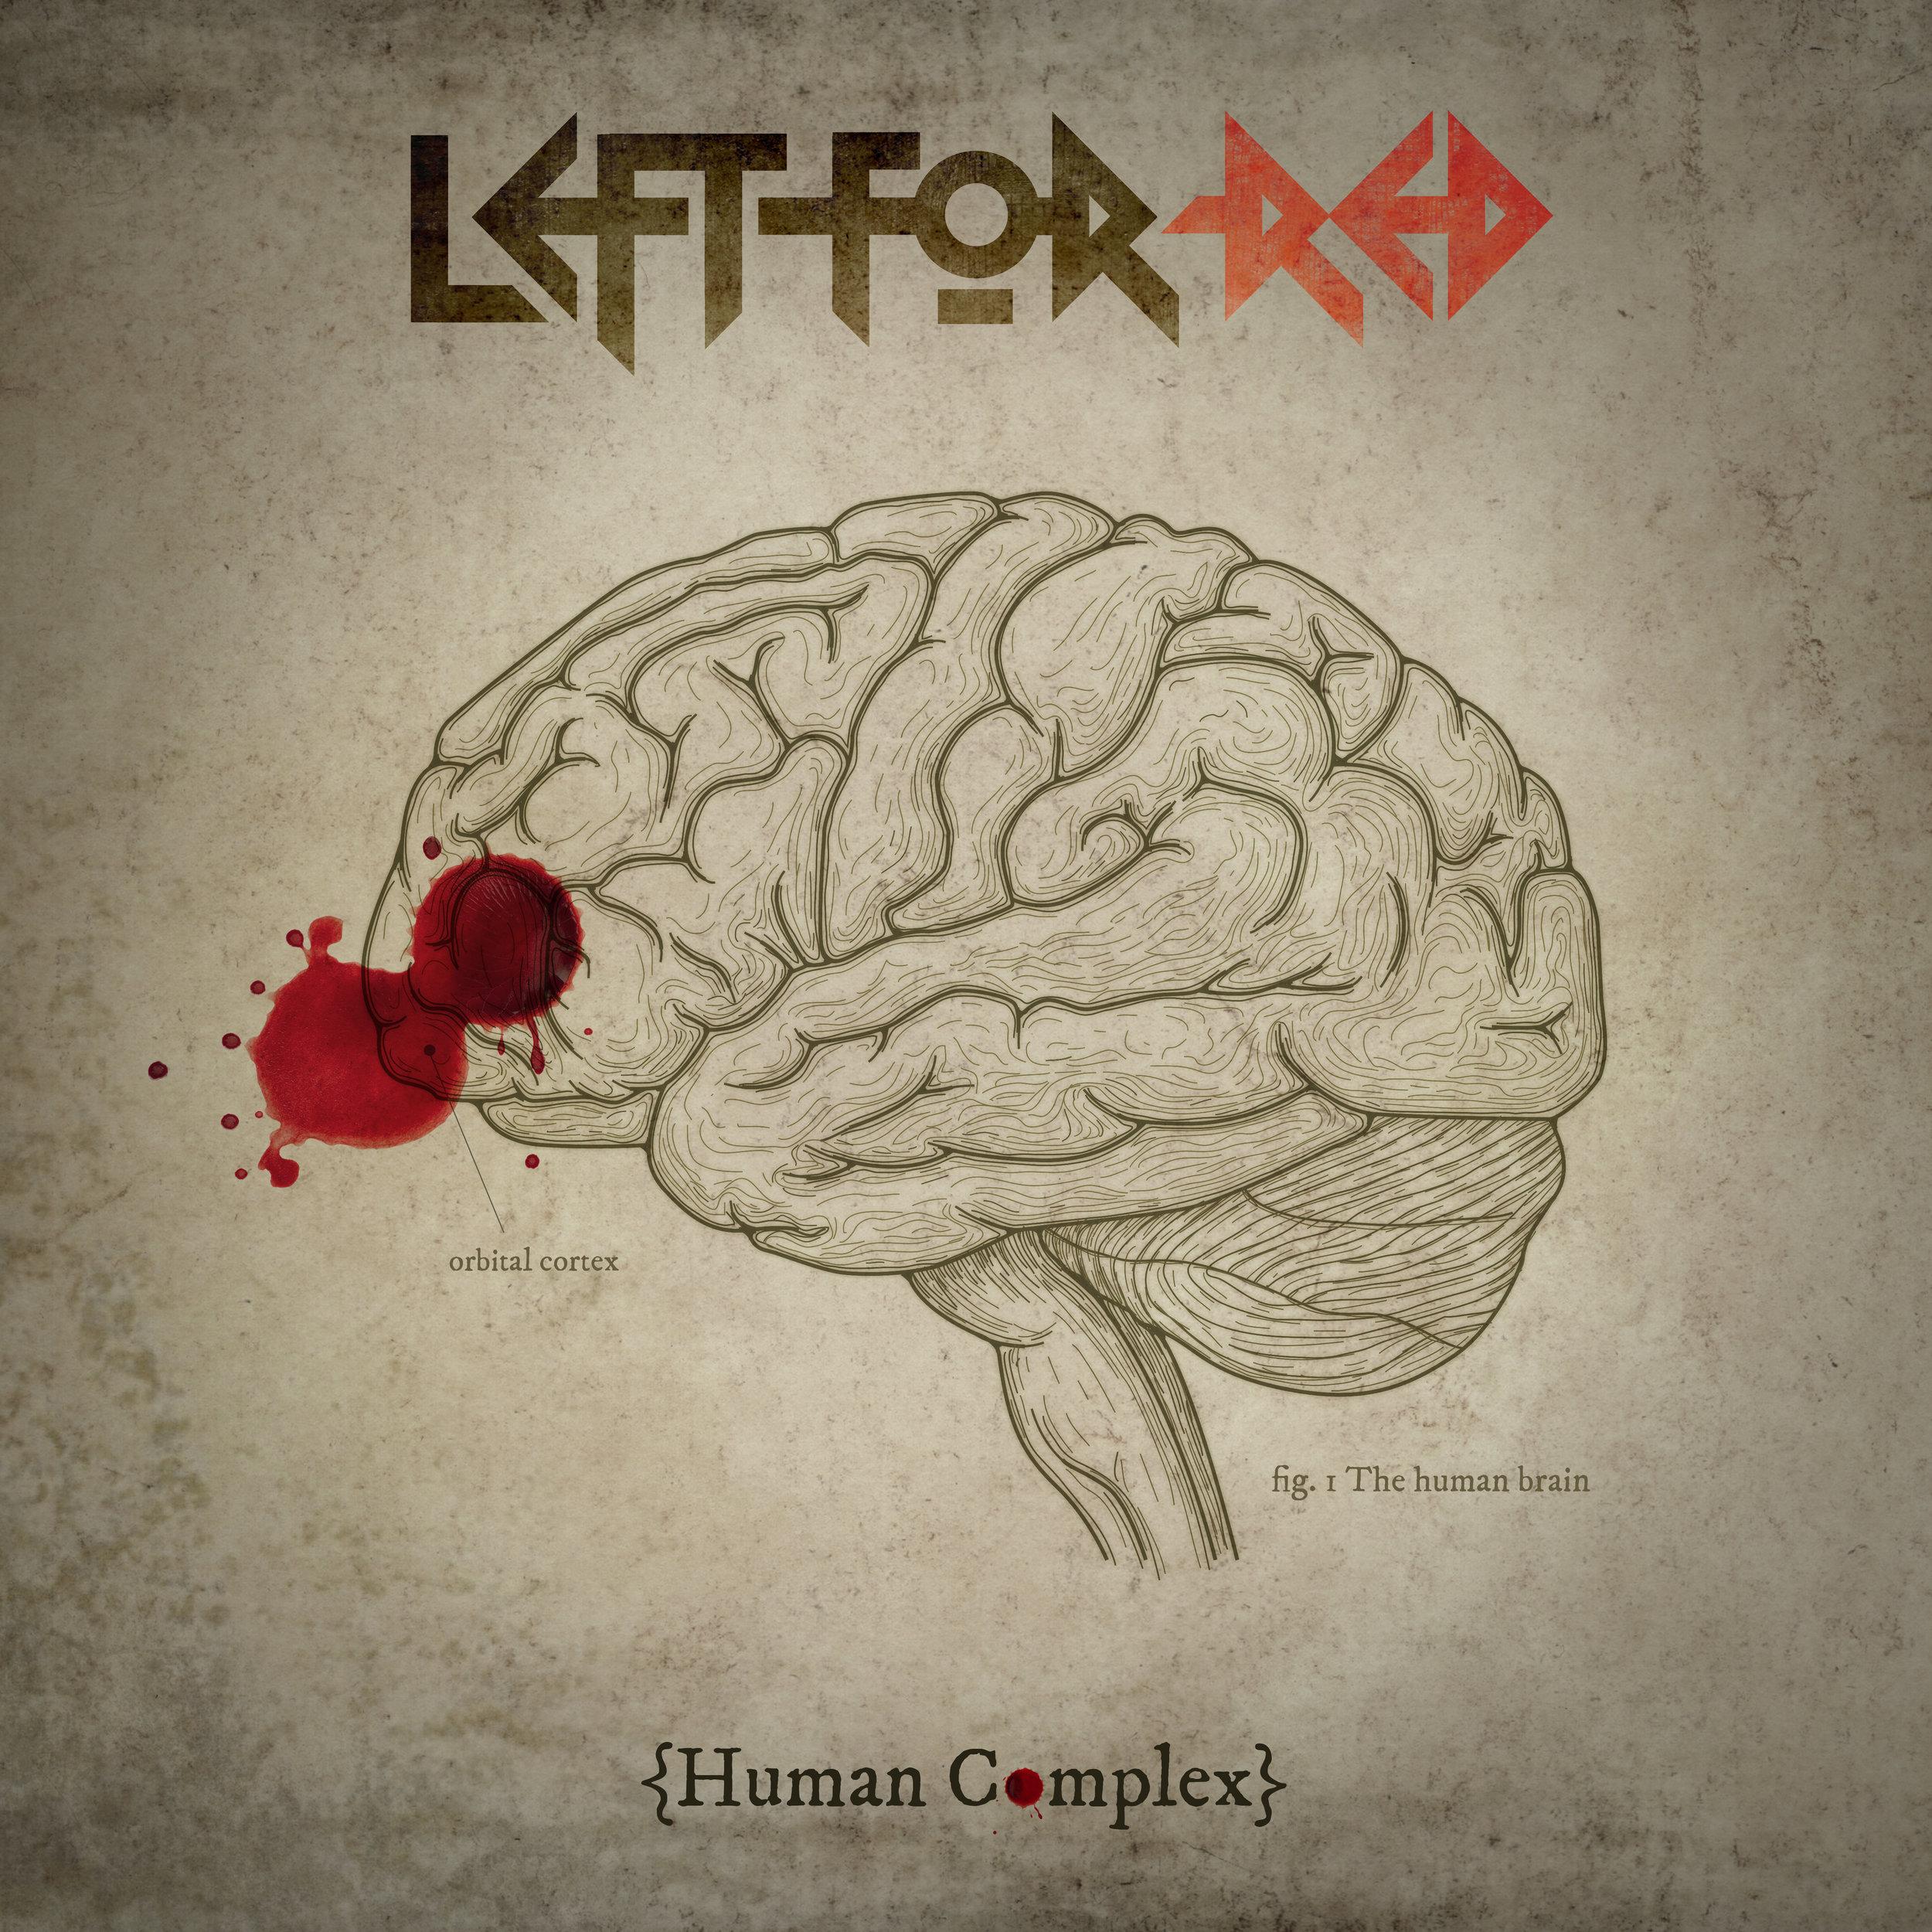 LFR_HUMANCOMPLEX_ARTWORK.jpg